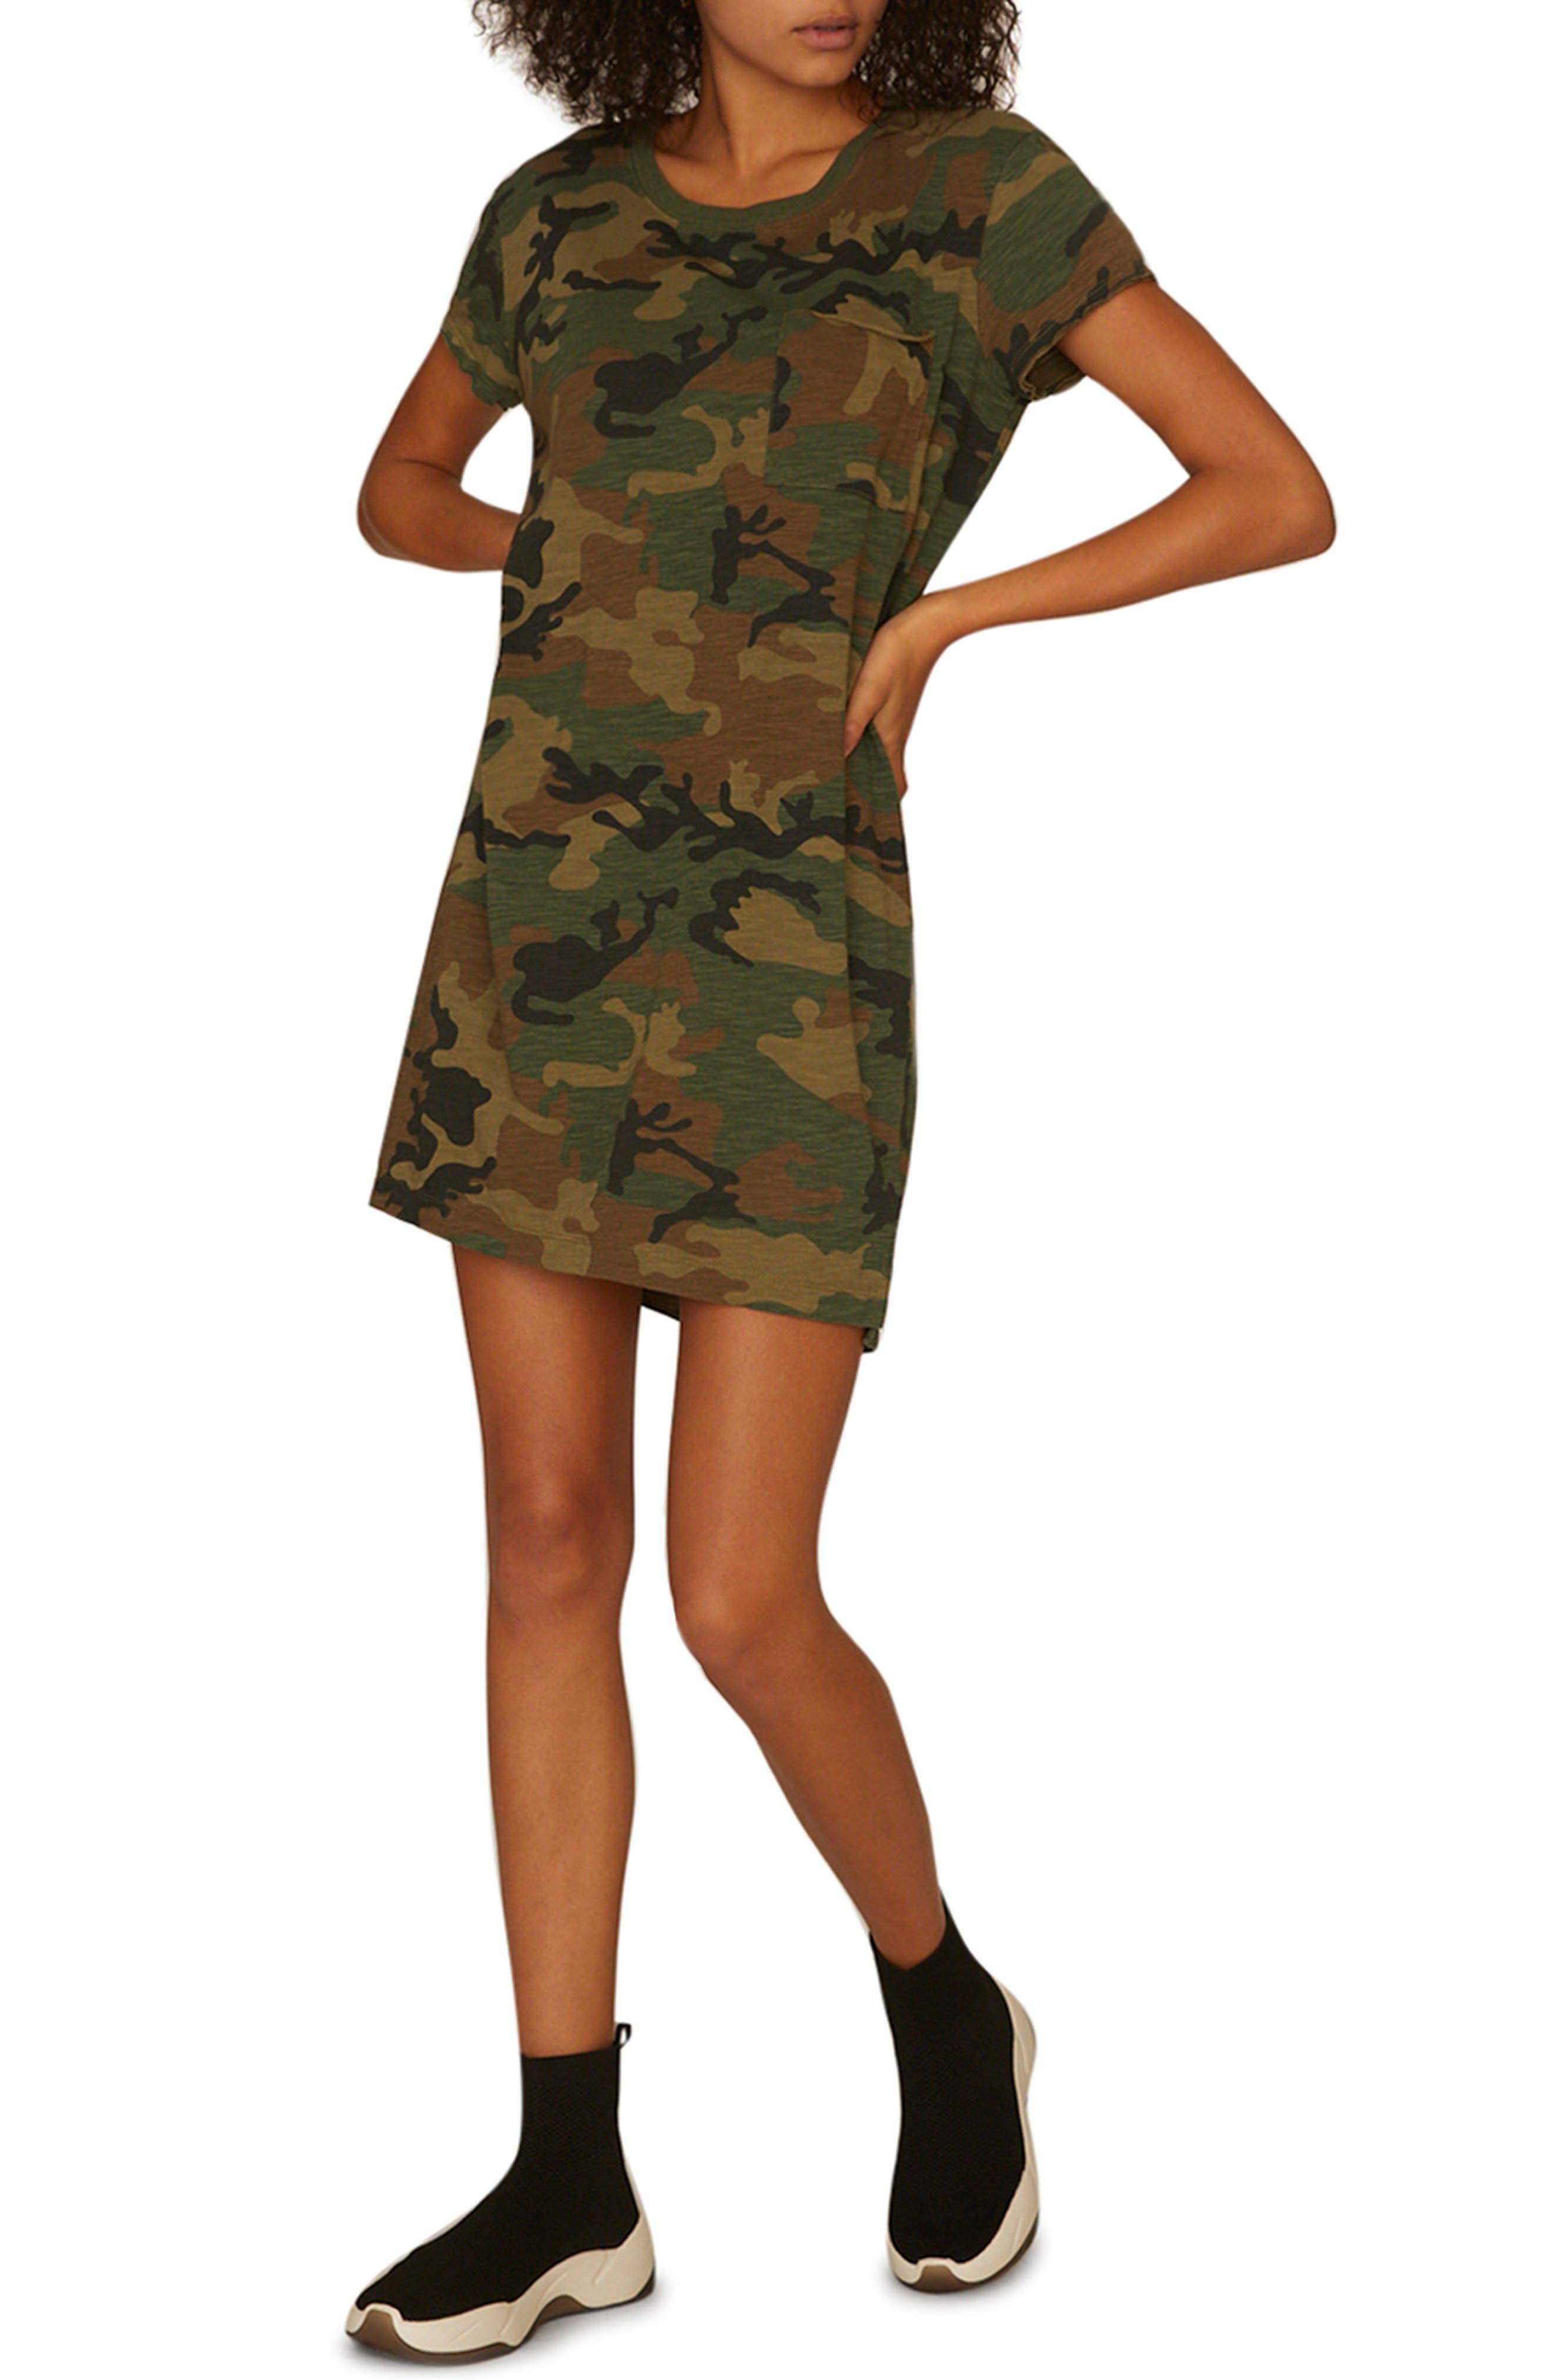 SANCTUARY, Camo Print T-Shirt Dress, Main thumbnail 1, color, LOVE CAMO